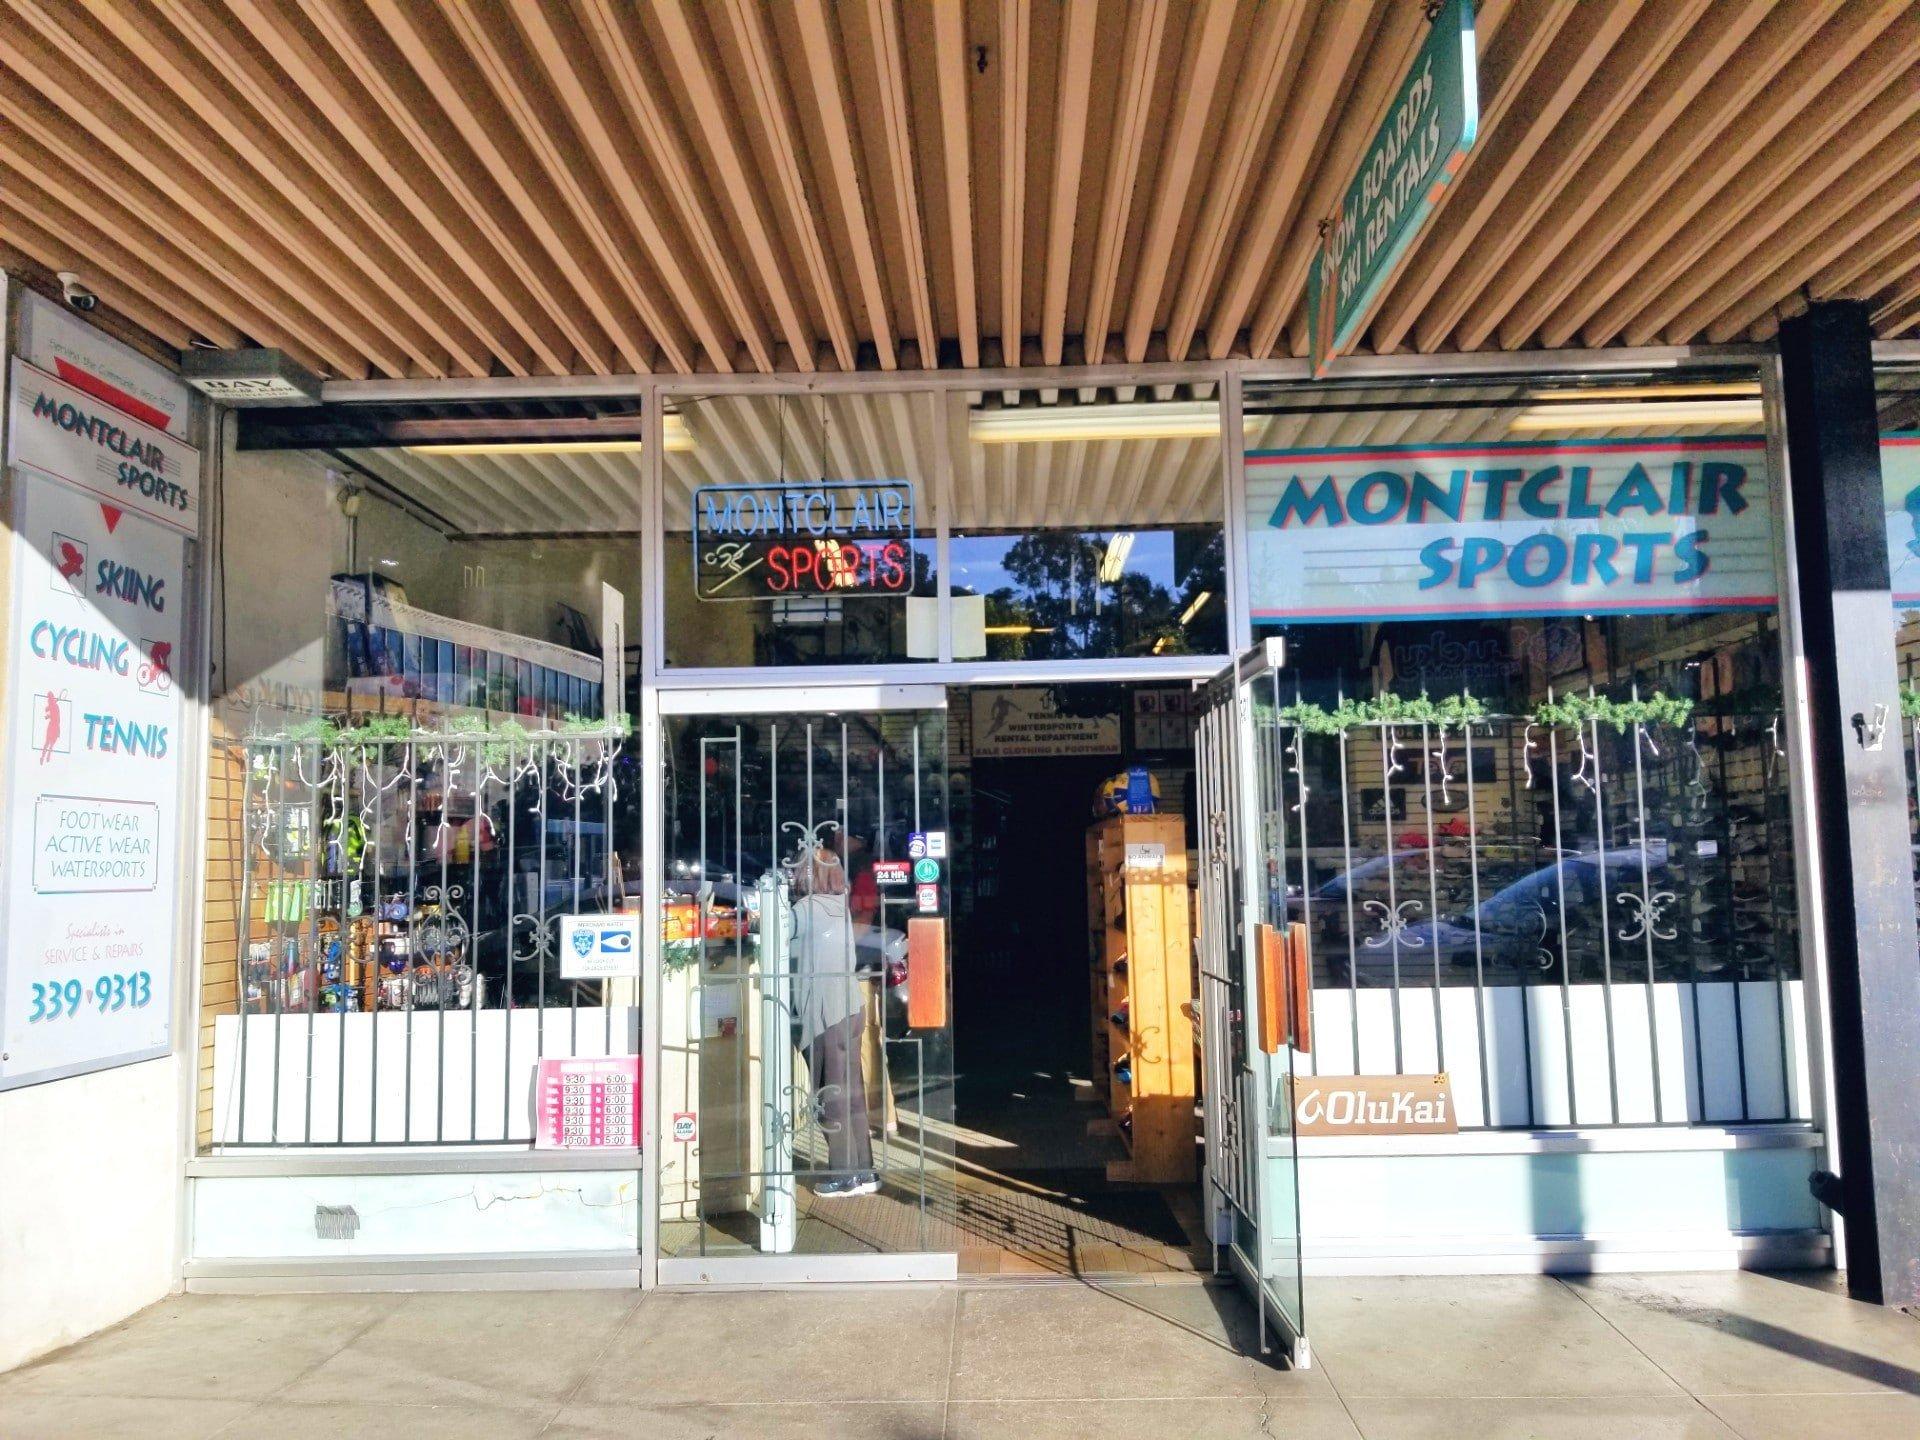 Montclair Sports, Oakland CA